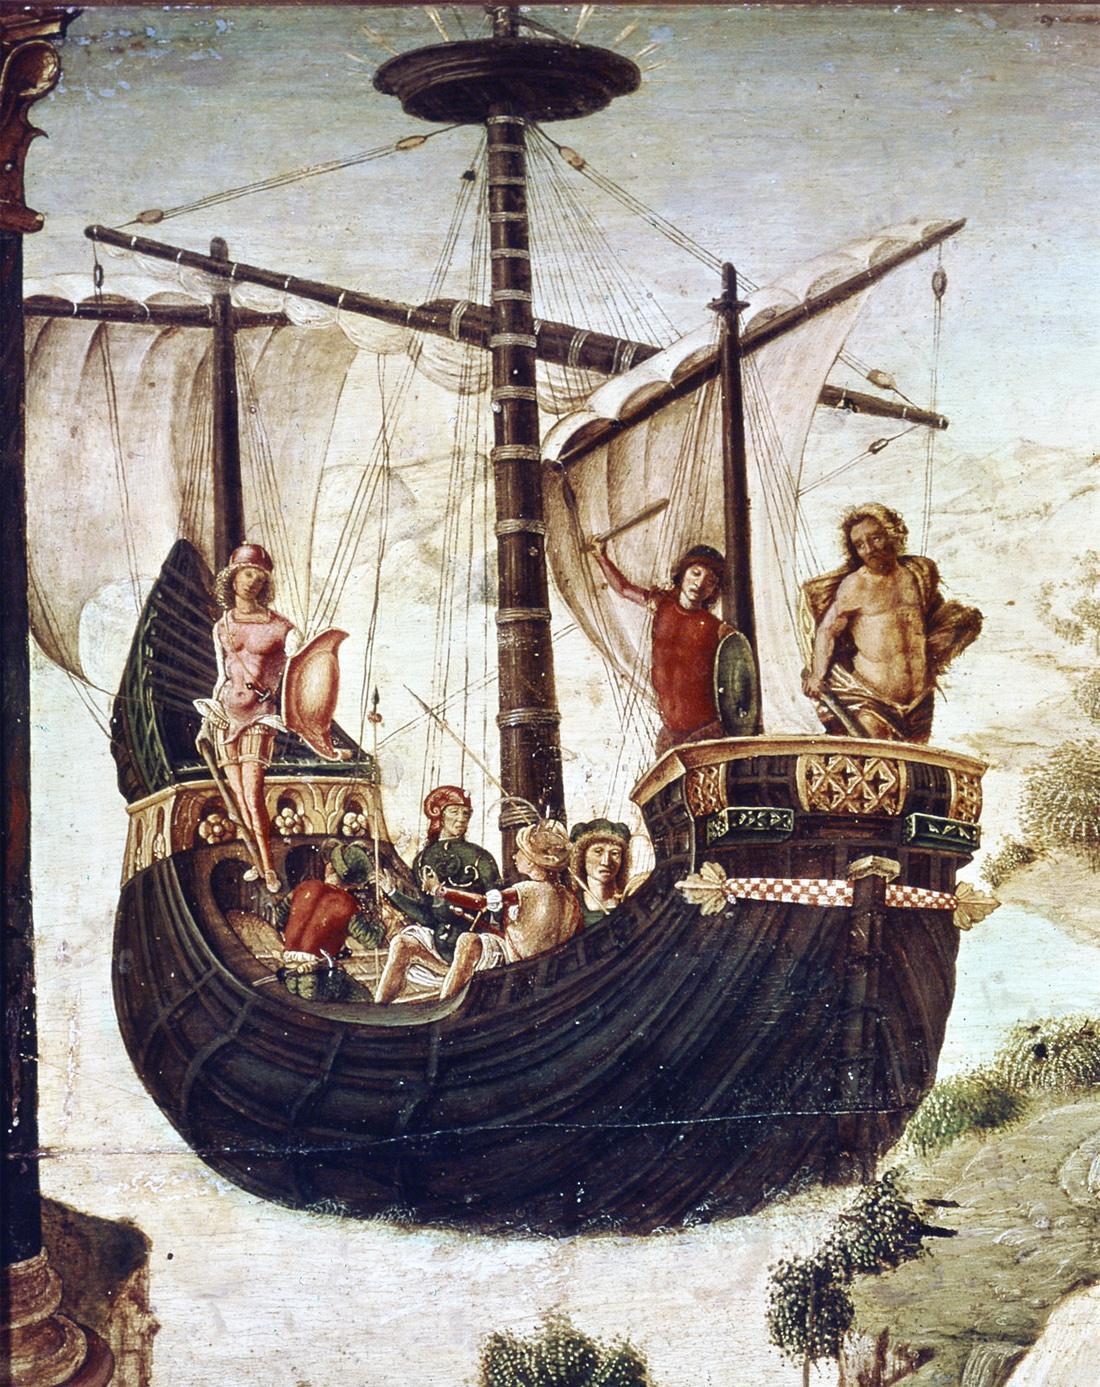 The Argonauts, by Lorenzo Costa, c. 1488. Museo Civico, Padua, Italy.